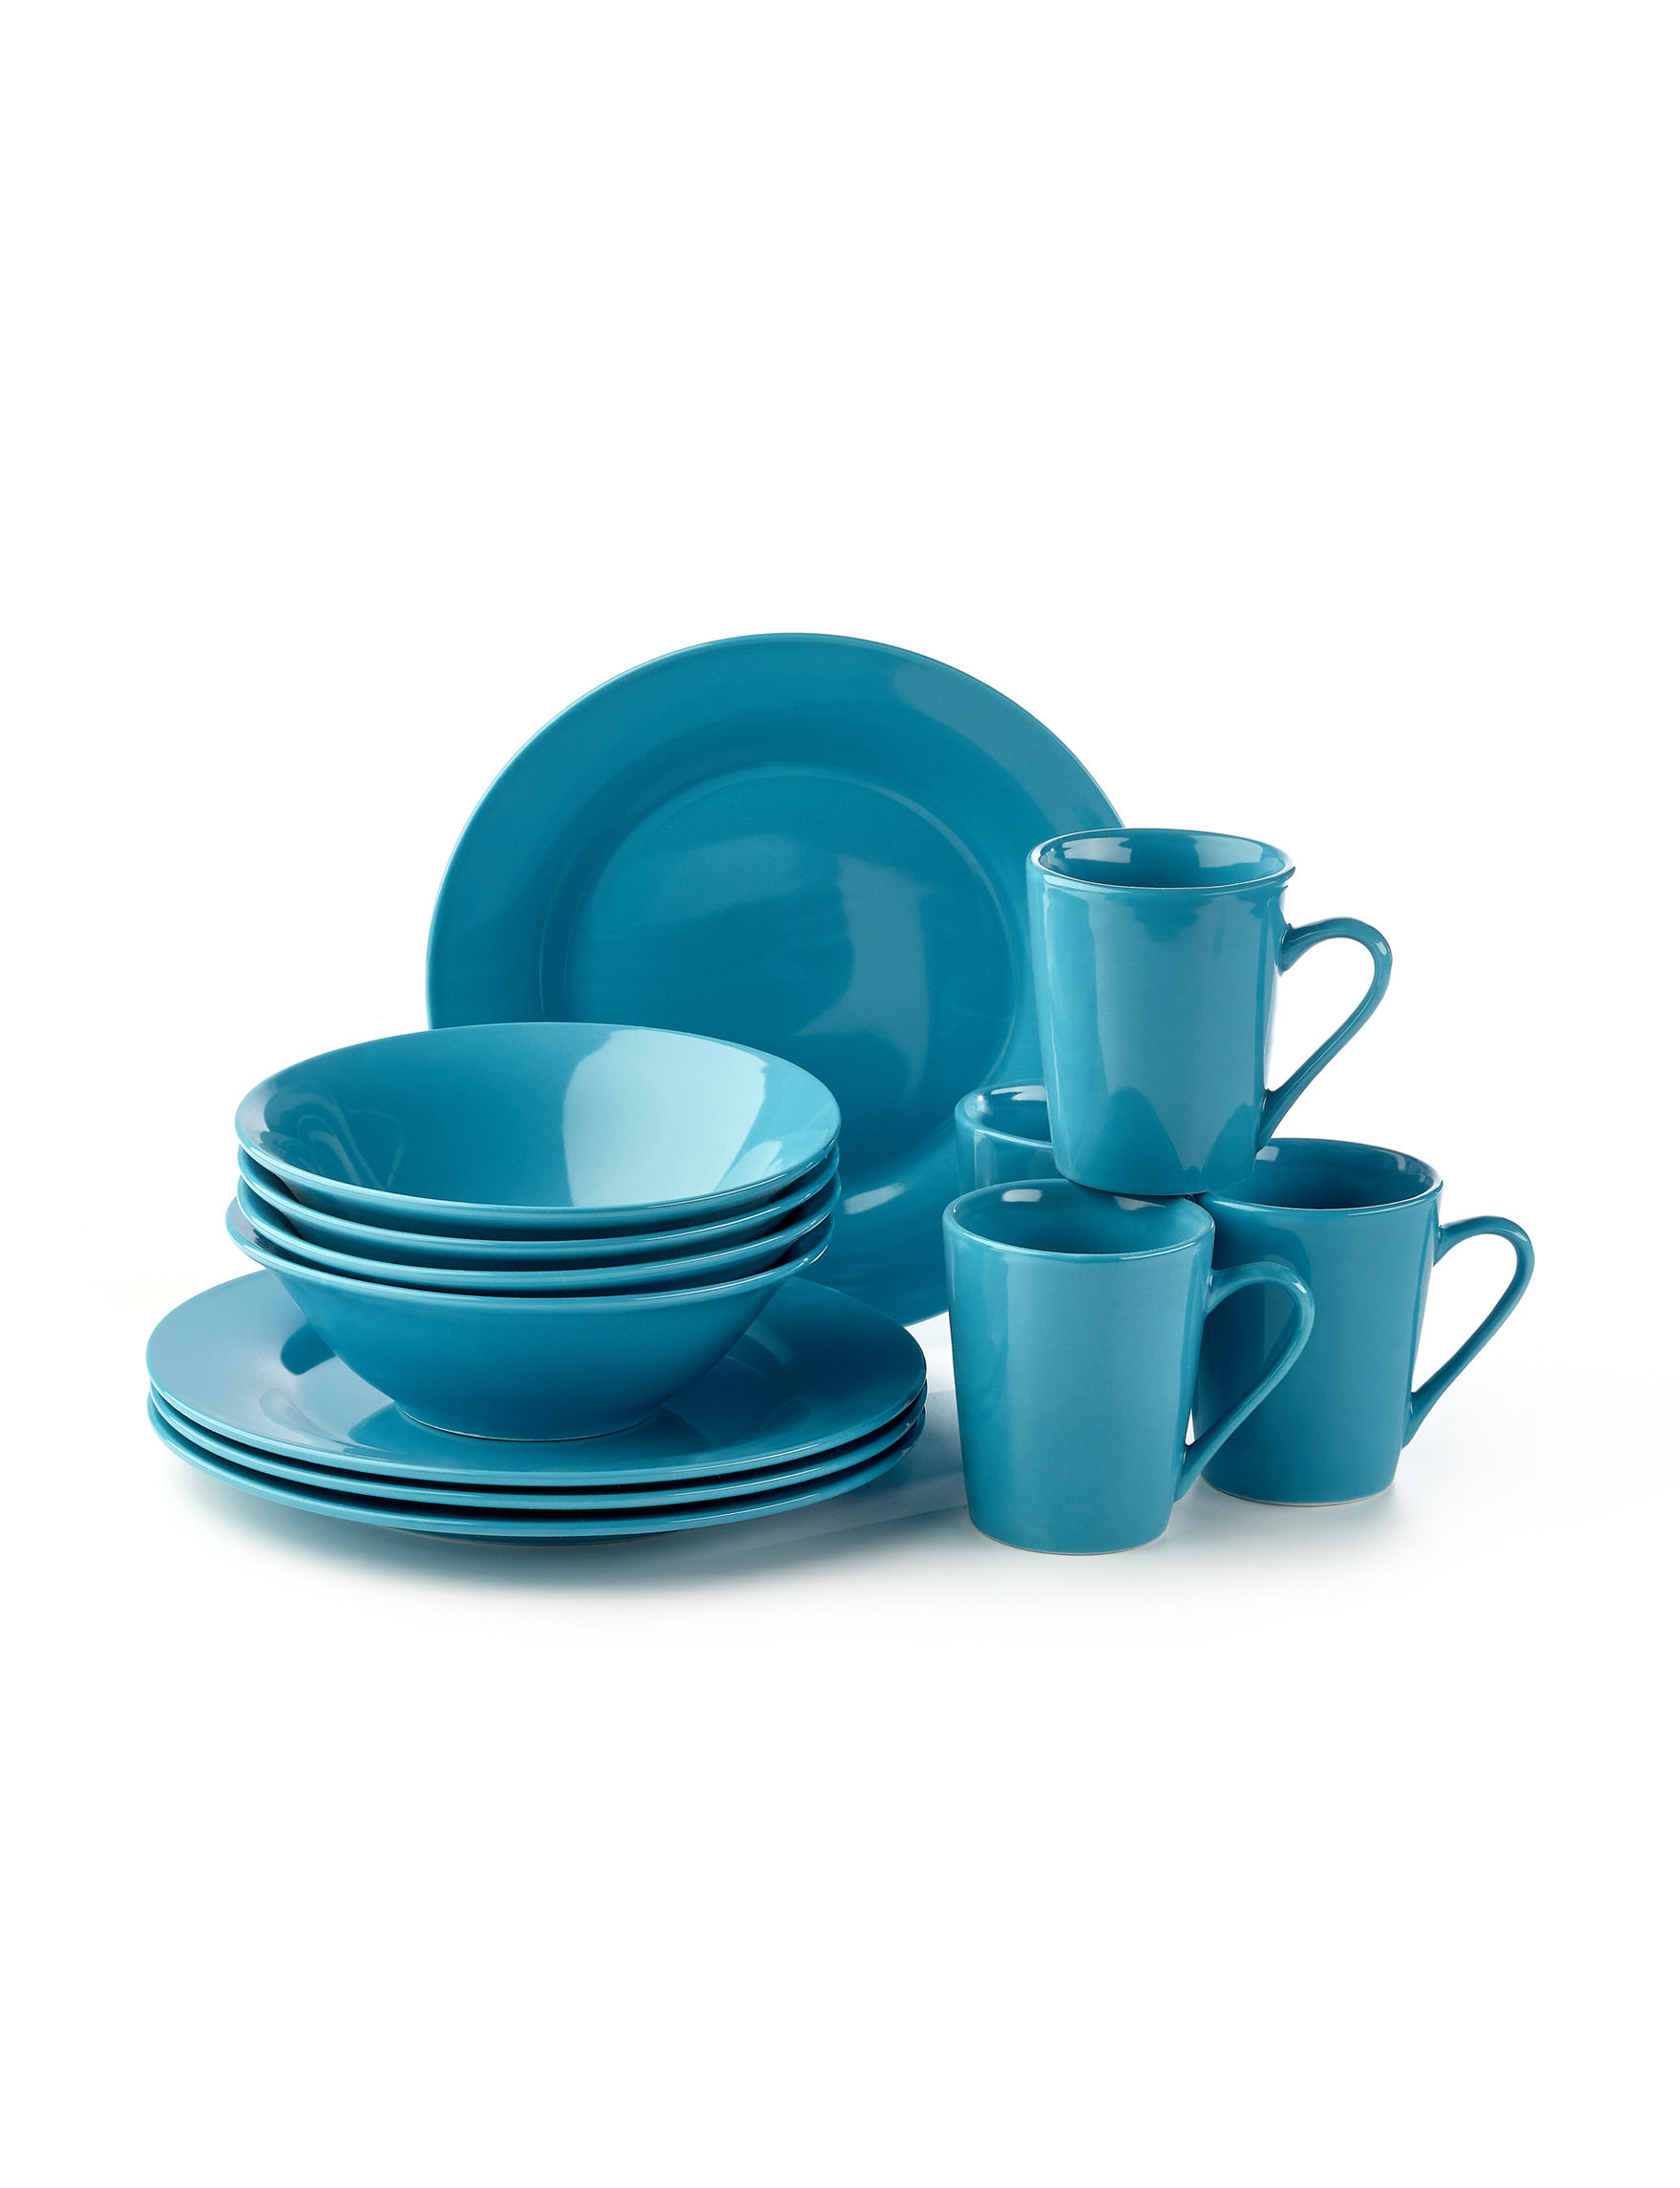 Gibson Blue Dinnerware Sets Dinnerware